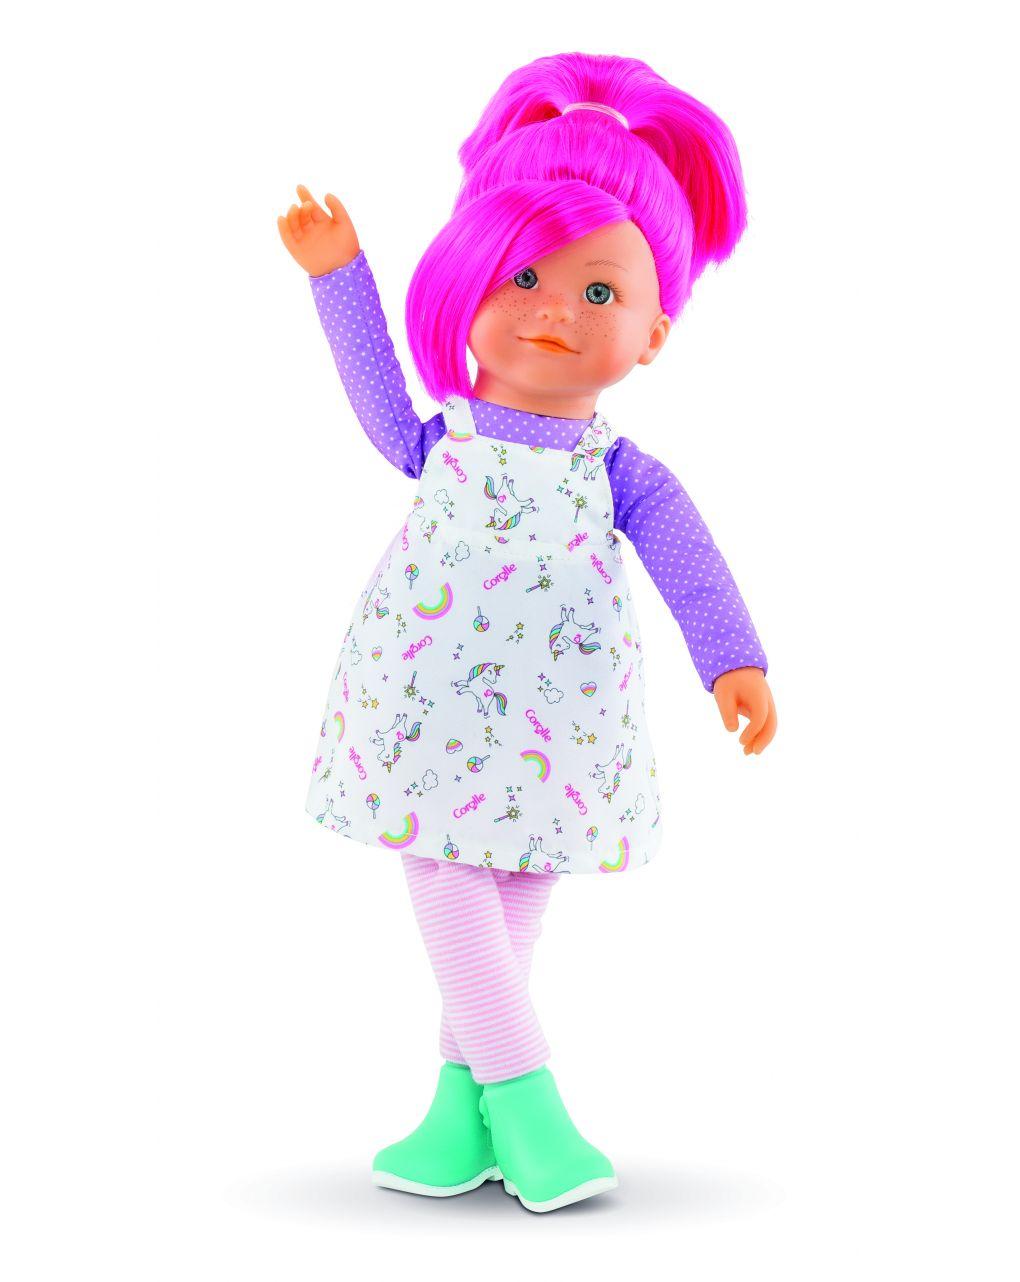 Corolle - rainbow doll - nephelie - Corolle